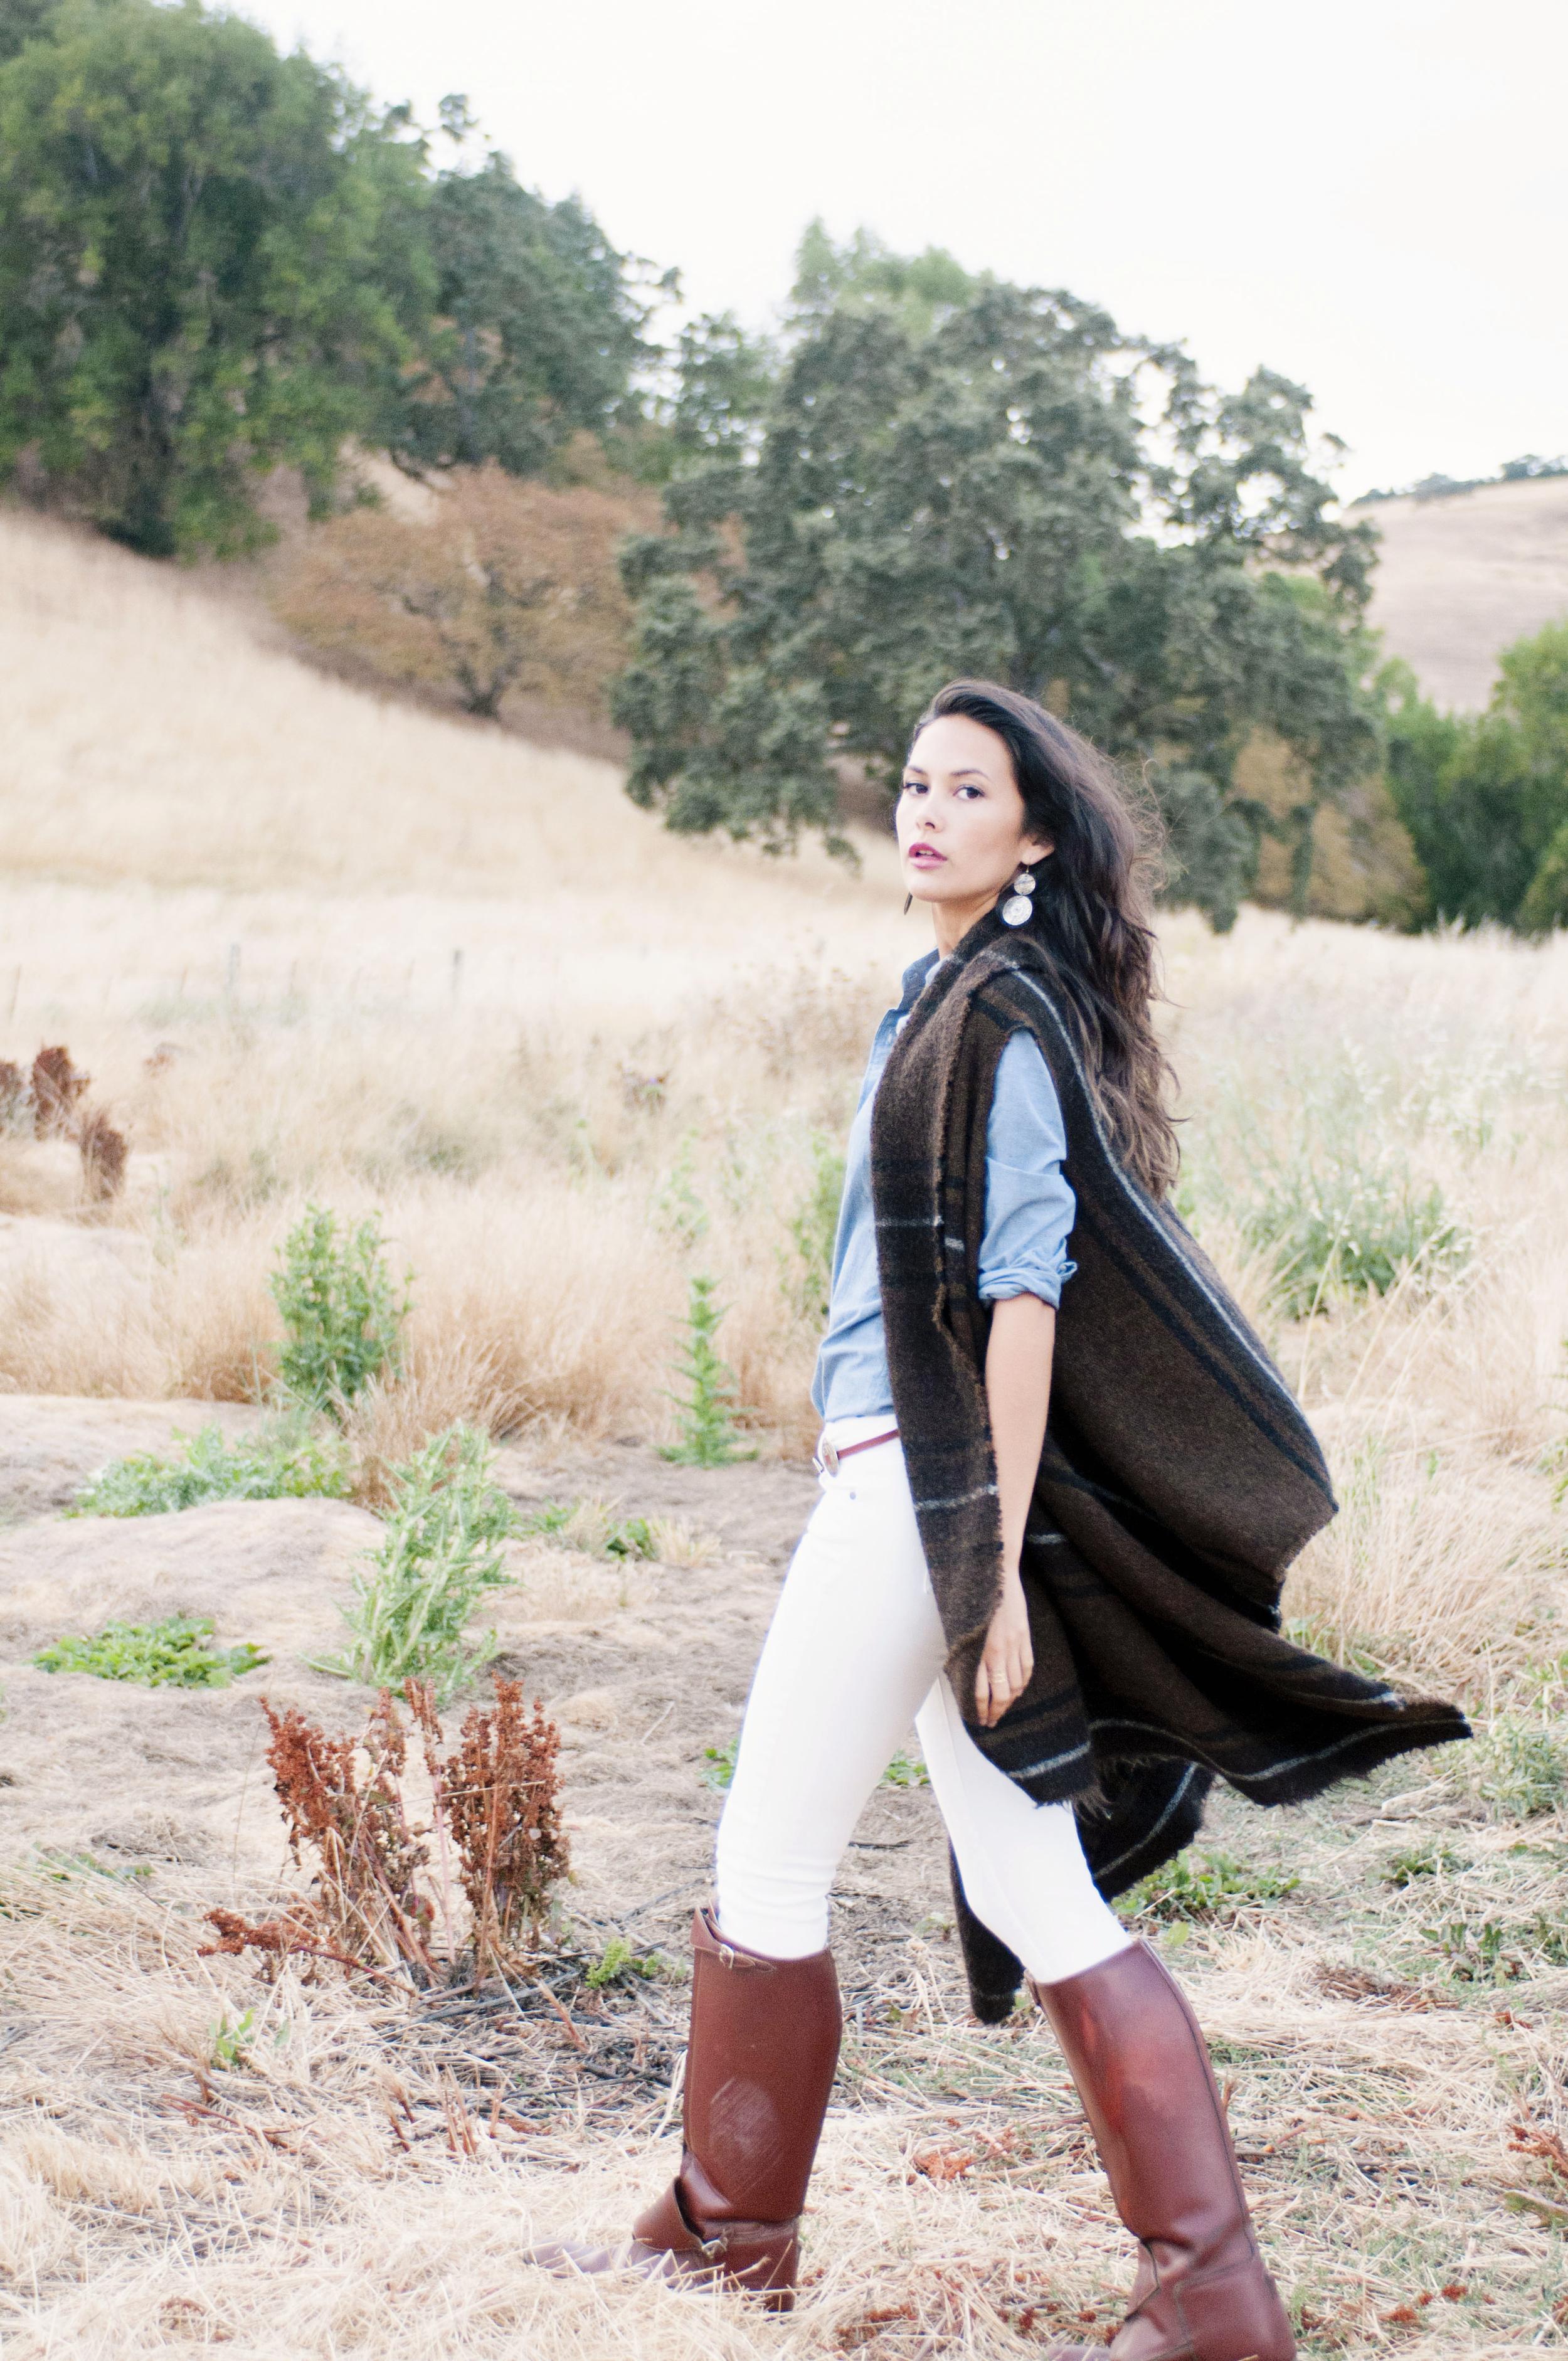 photo: Angie Silvy    H/MKU: Diane Catorc    model: ana @ scout model agency